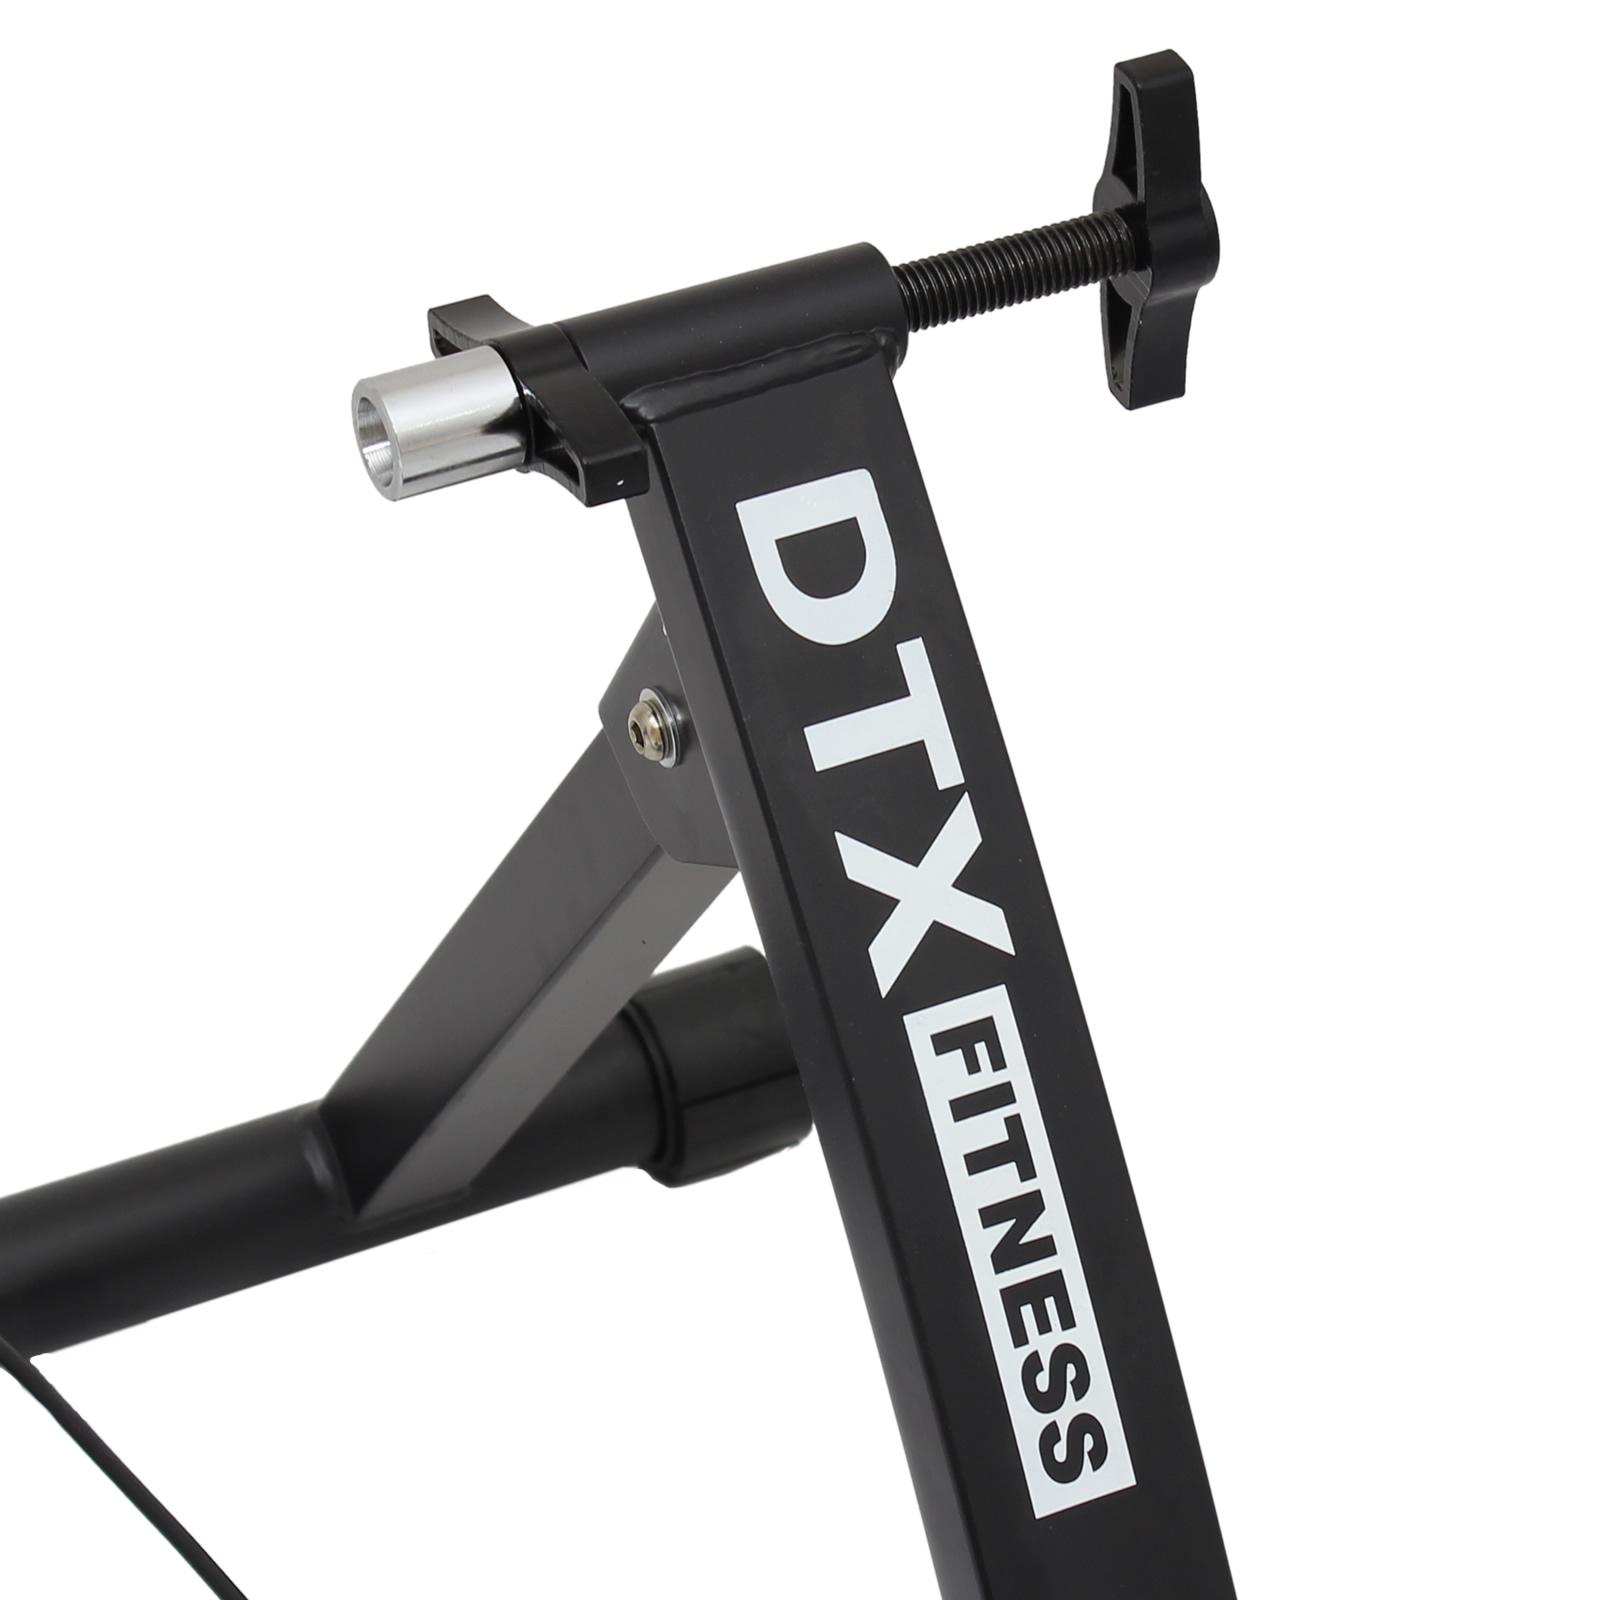 dtx fitness entraineur home trainer turbo r glable v lo d. Black Bedroom Furniture Sets. Home Design Ideas